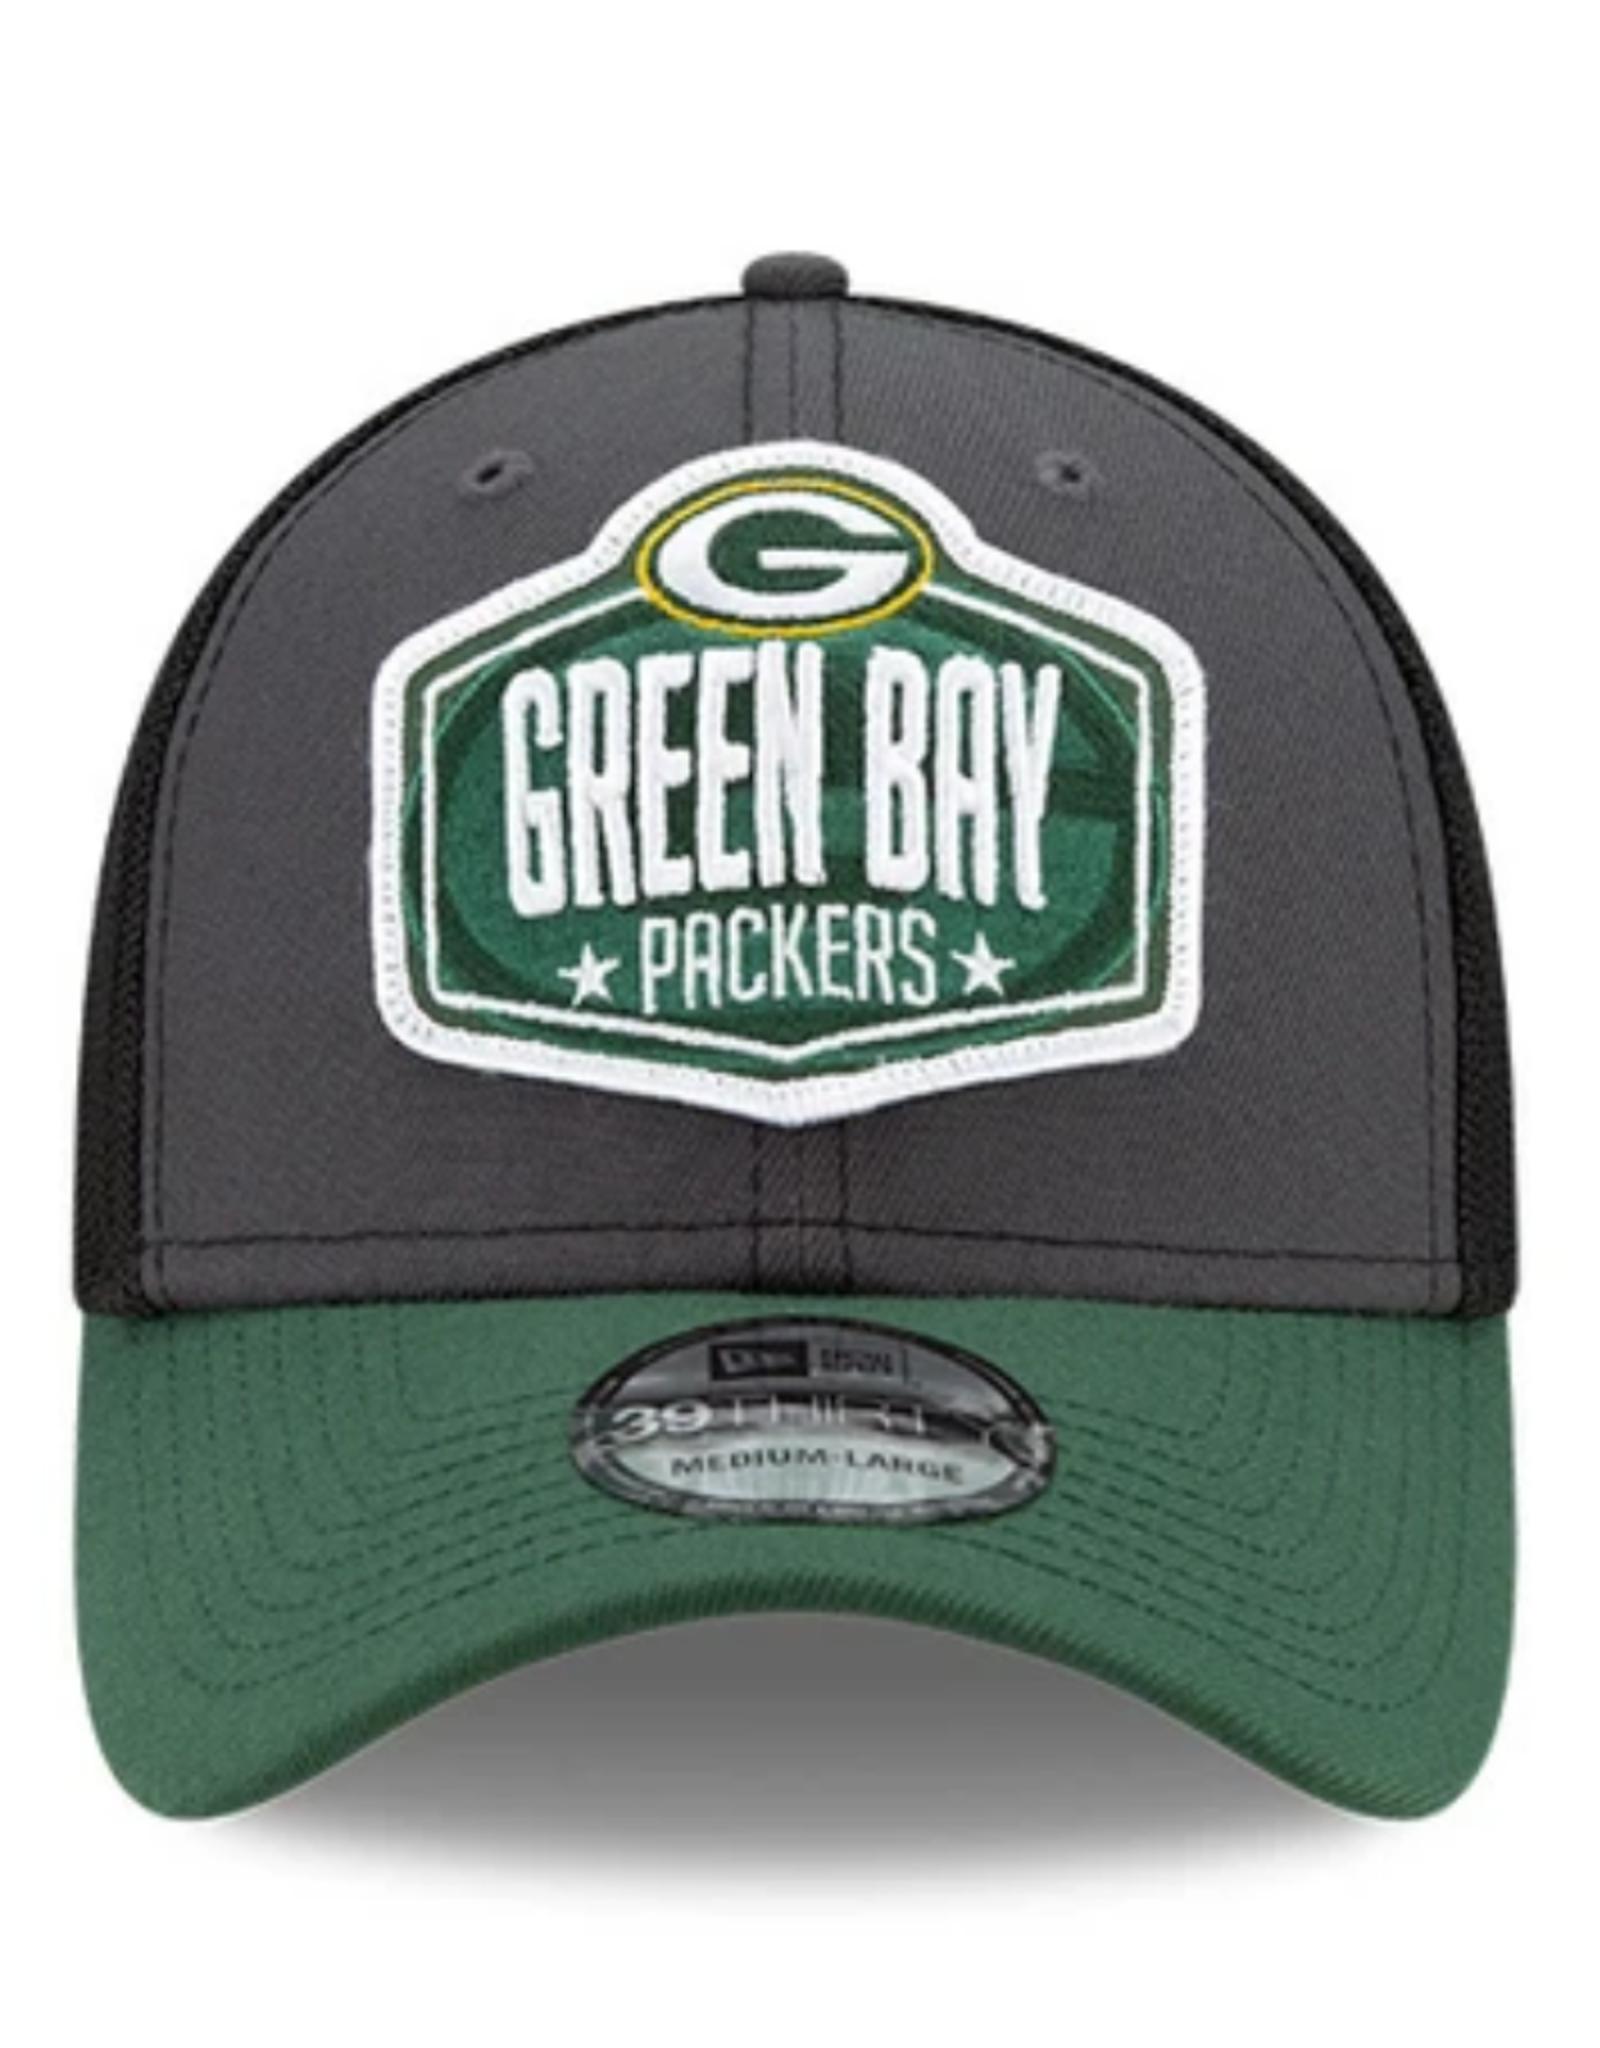 New Era Men's '21 39THIRTY NFL Draft Hat Green Bay Packers